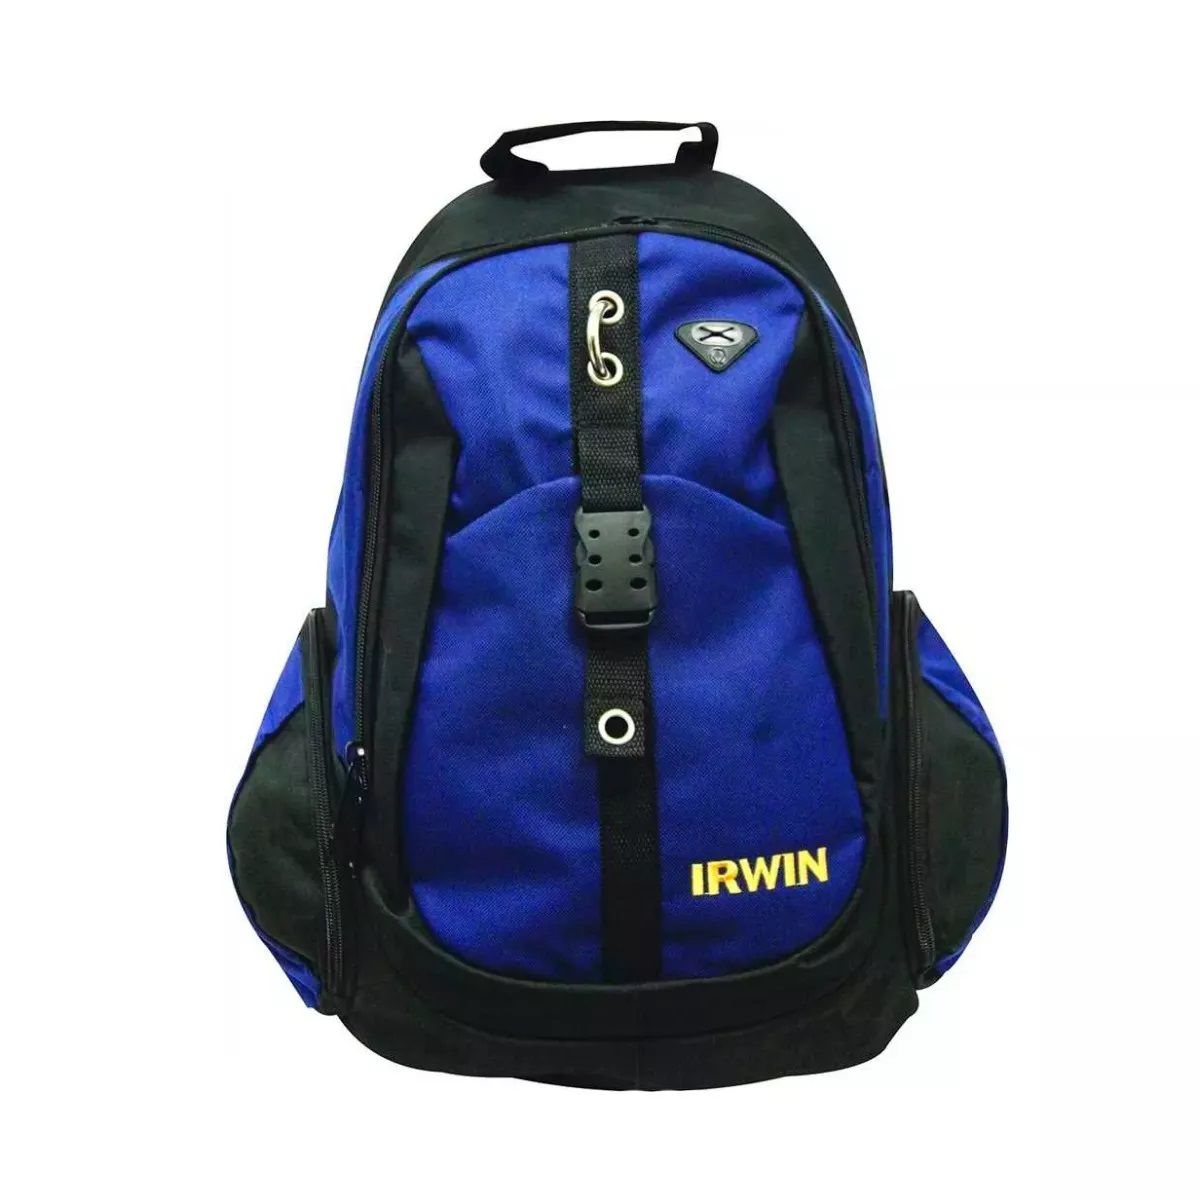 "Bolsa/mala para Ferramentas Standard 14"" Irwin"